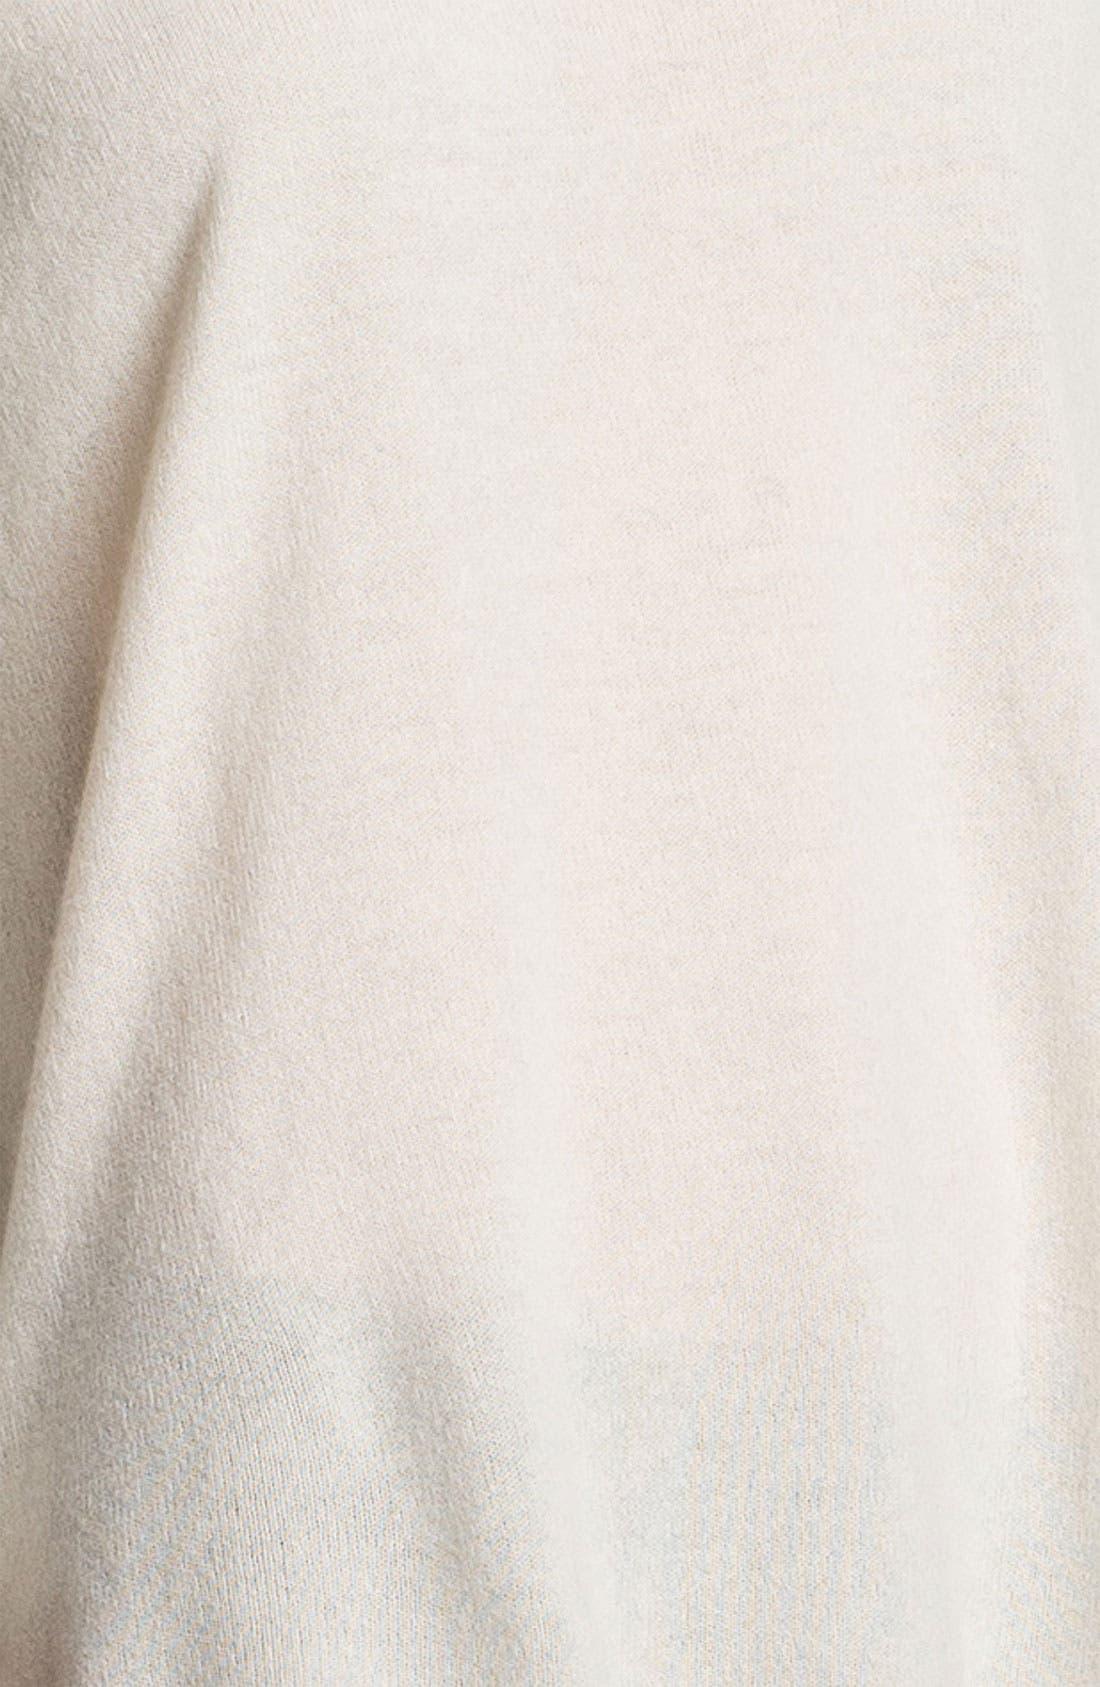 Colorblock Cashmere Sweater,                             Alternate thumbnail 5, color,                             100